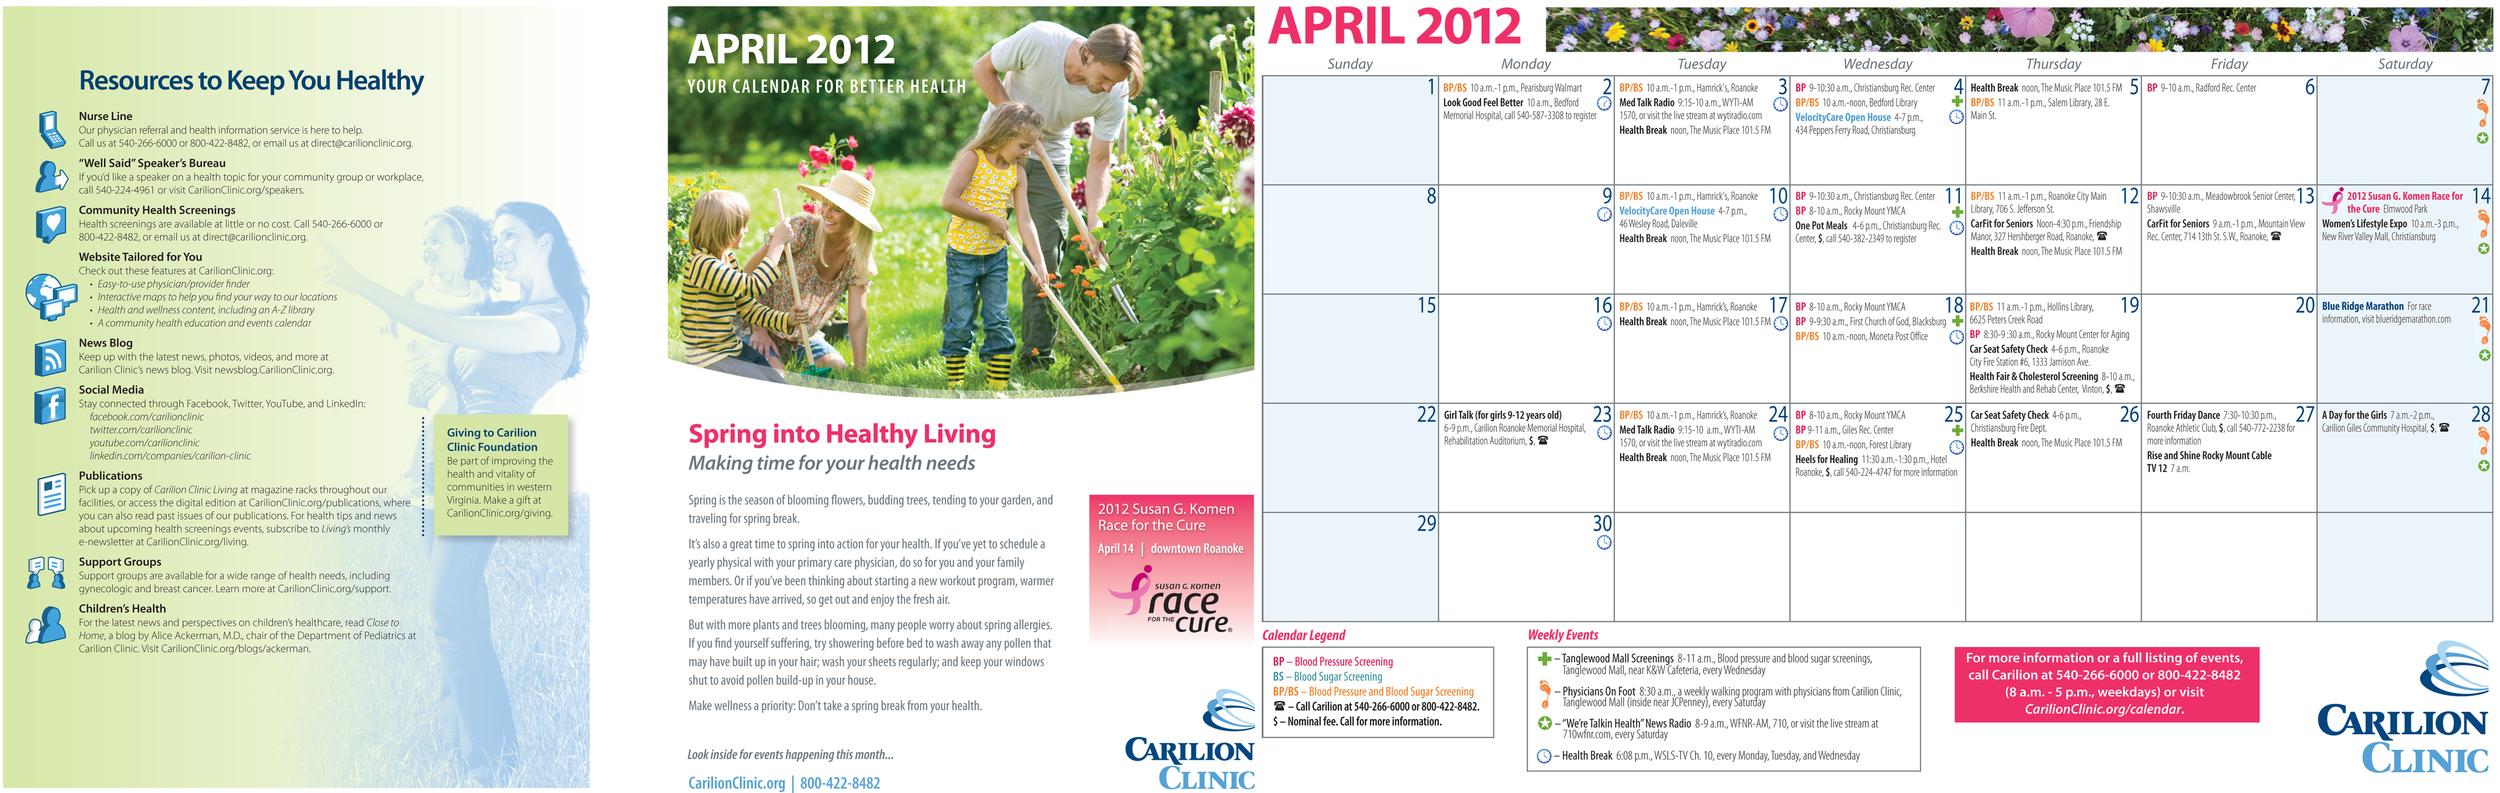 J847 Community Calendar April 2012.jpg